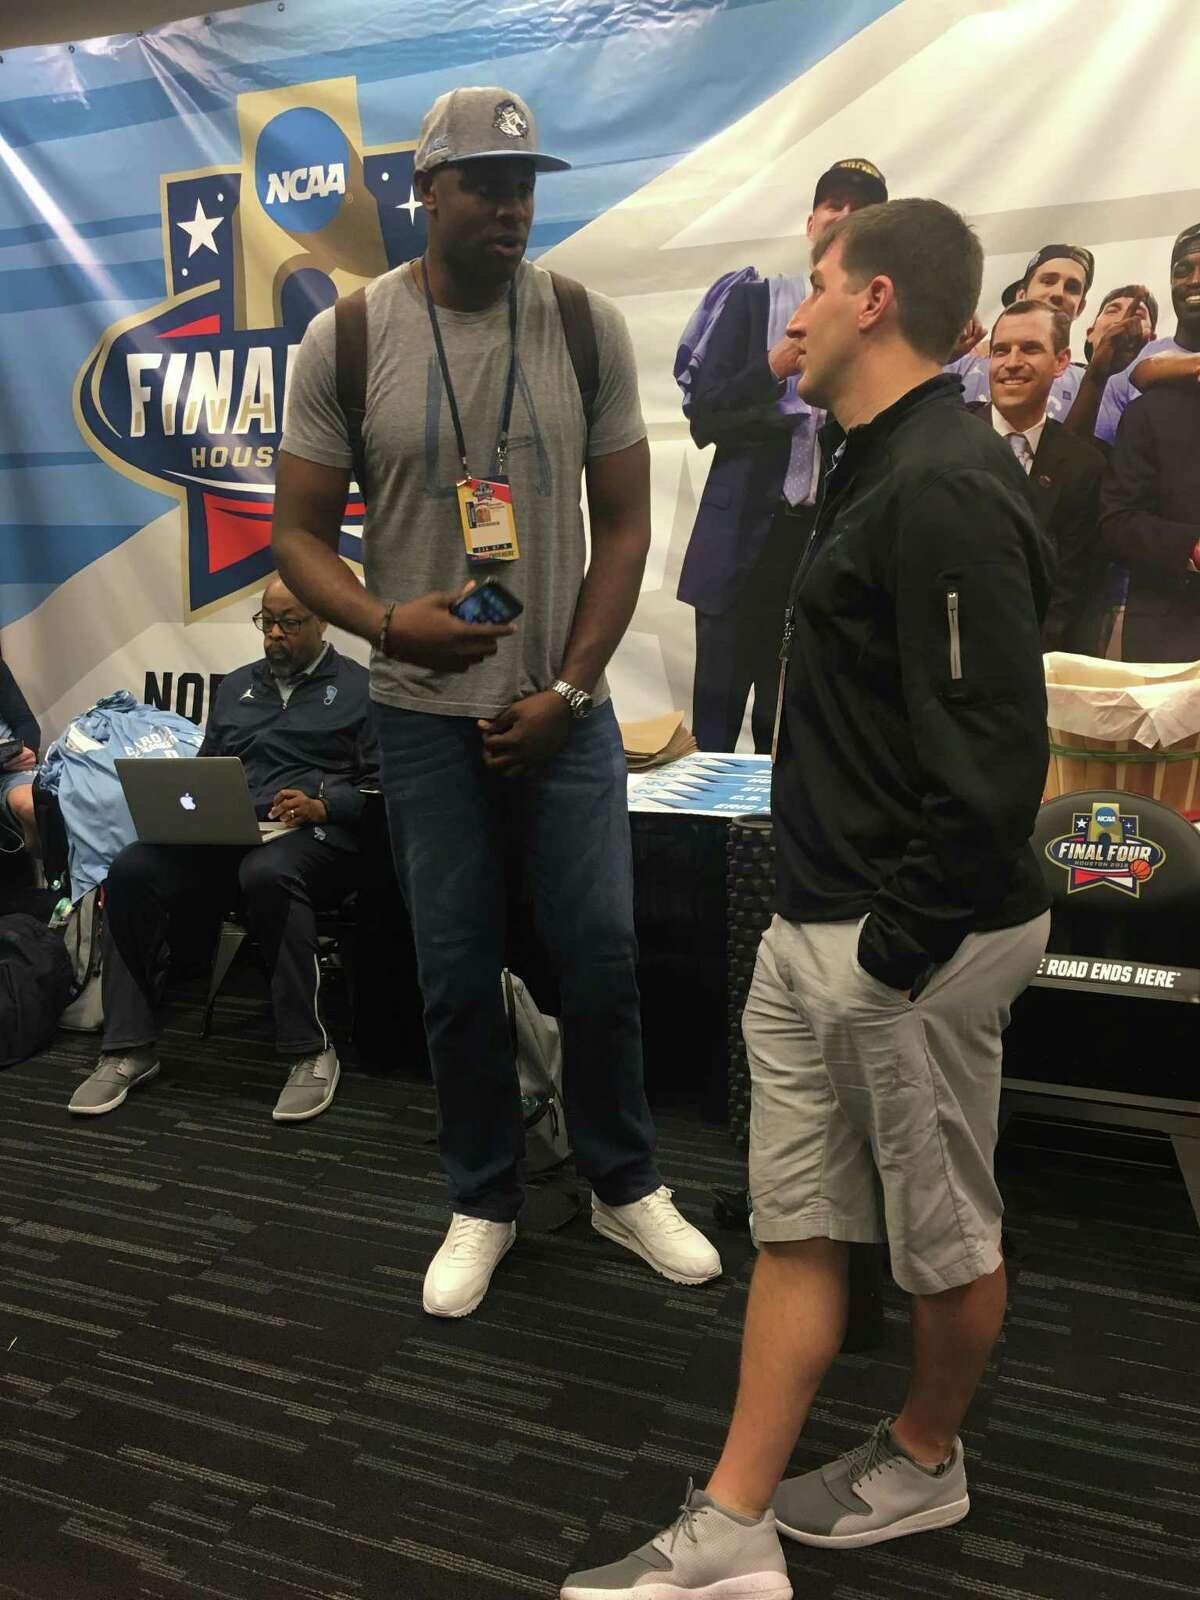 Former North Carolina star Brendan Haywood talks to the media at the Final Four on Friday at NRG Stadium.